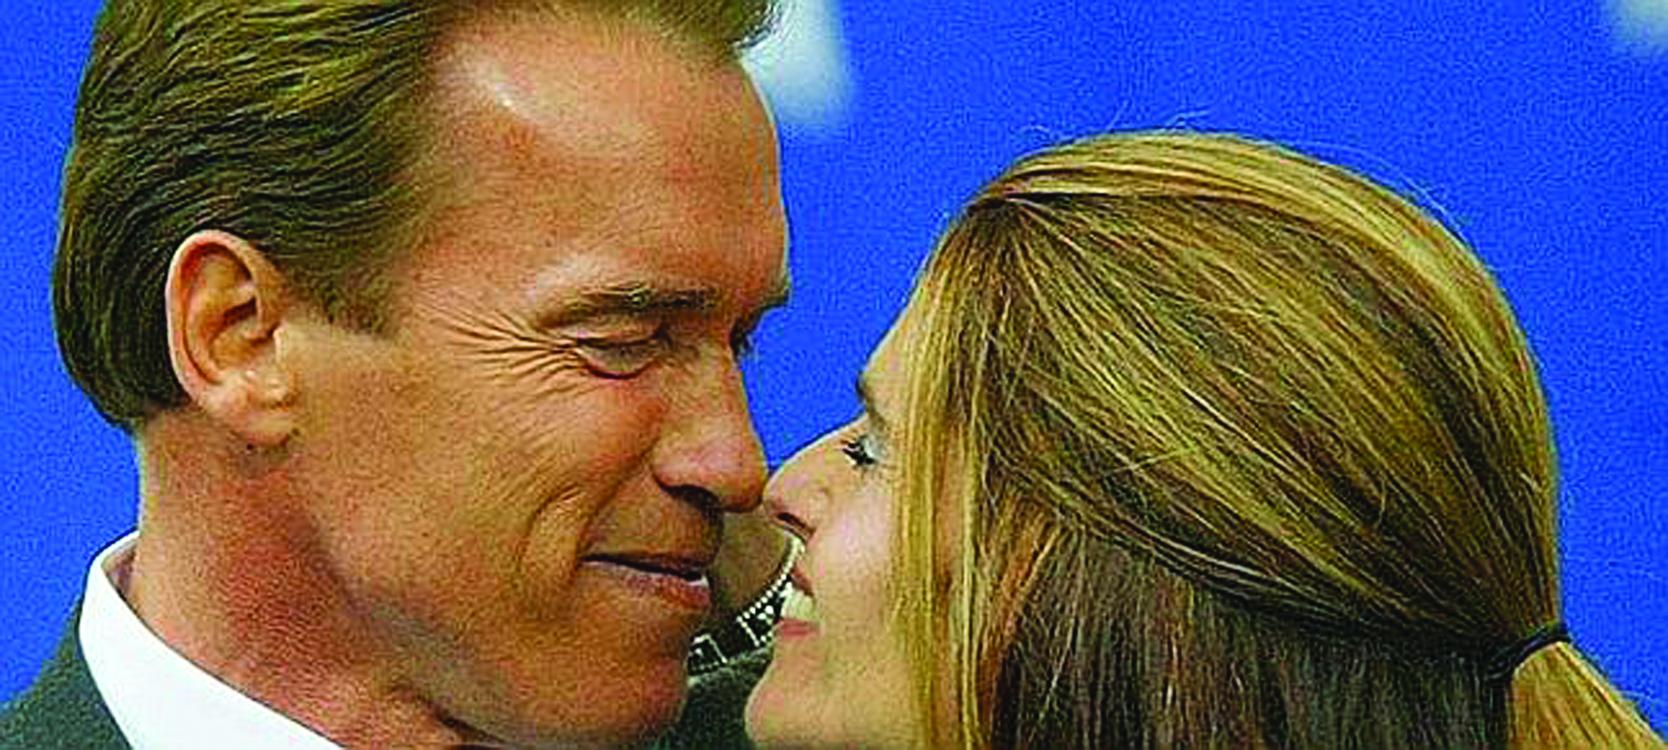 Schwarzenegger y Maria Shriver se separan